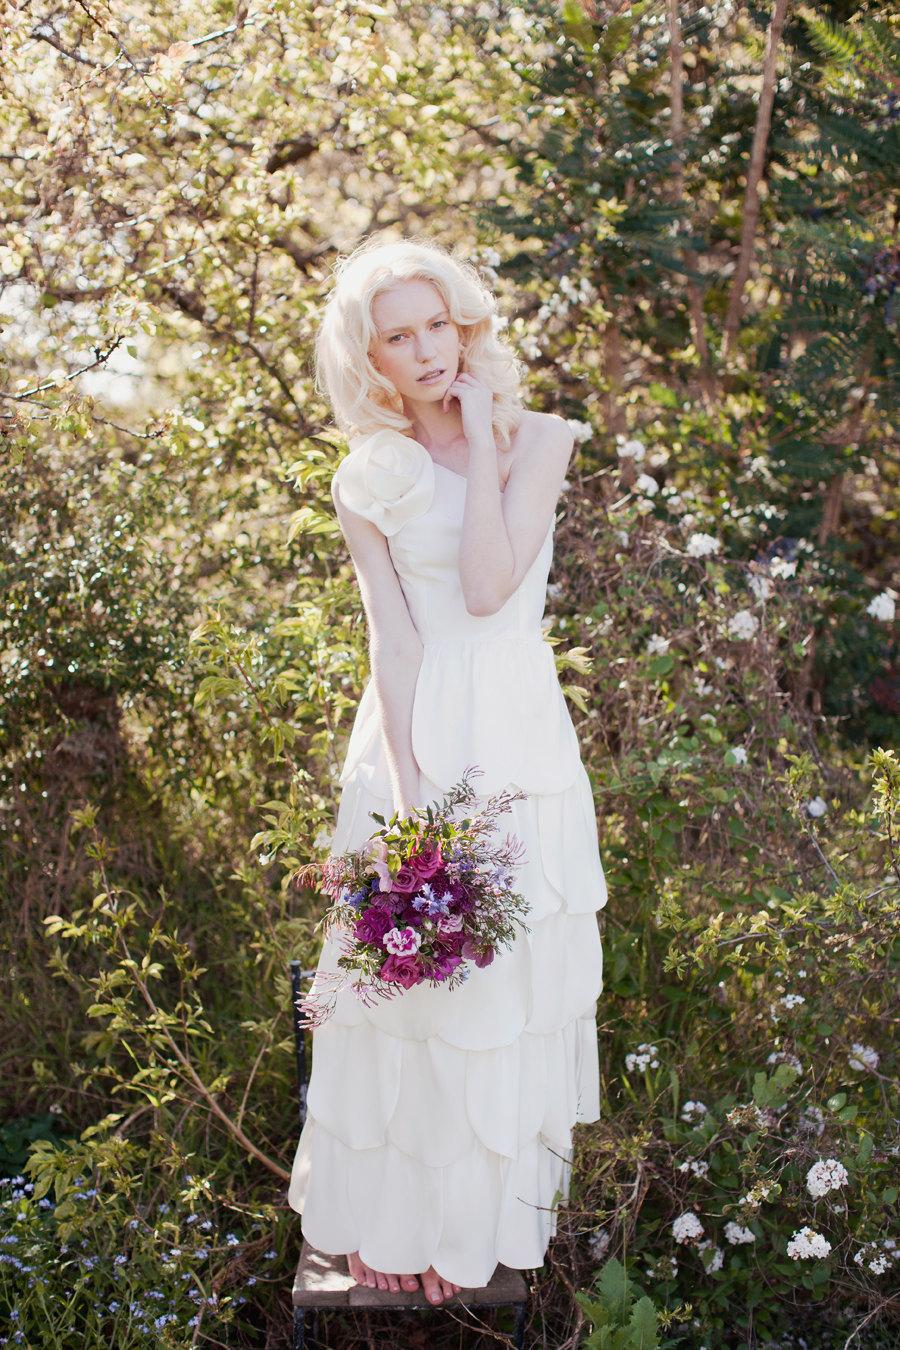 Handmade-wedding-dresses-bridal-designers-to-watch-kelsey-genna-begonia-2.full